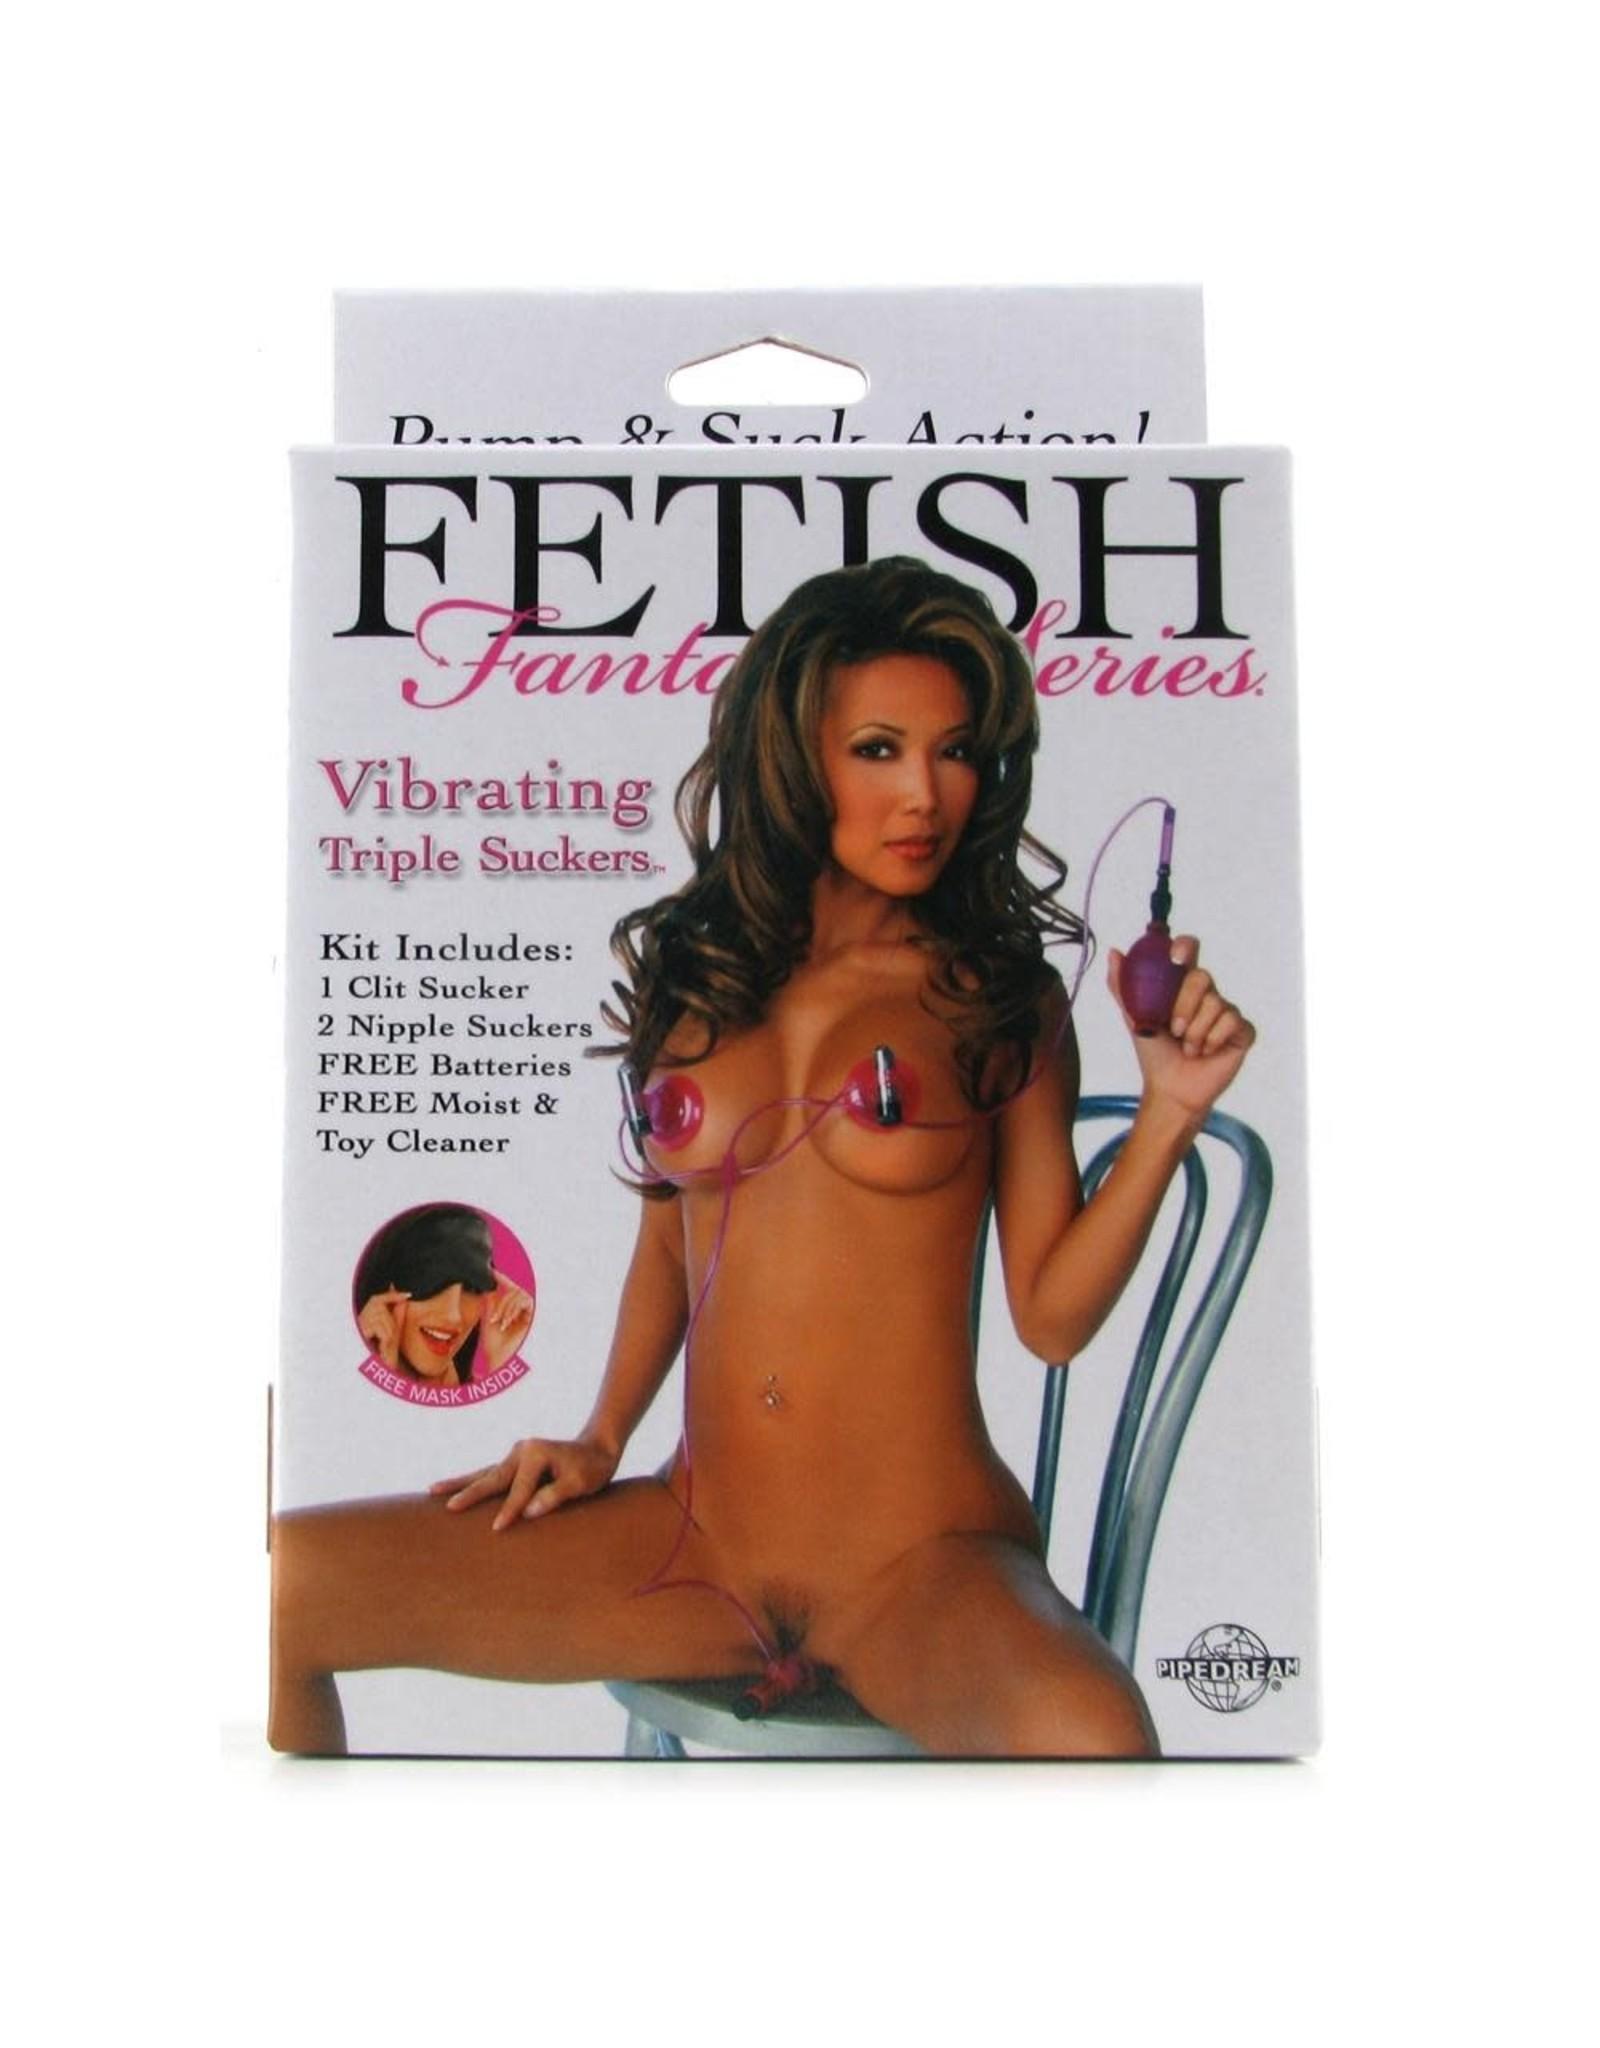 FETISH FANTASY FETISH FANTASY - VIBRATING TRIPLE SUCKERS